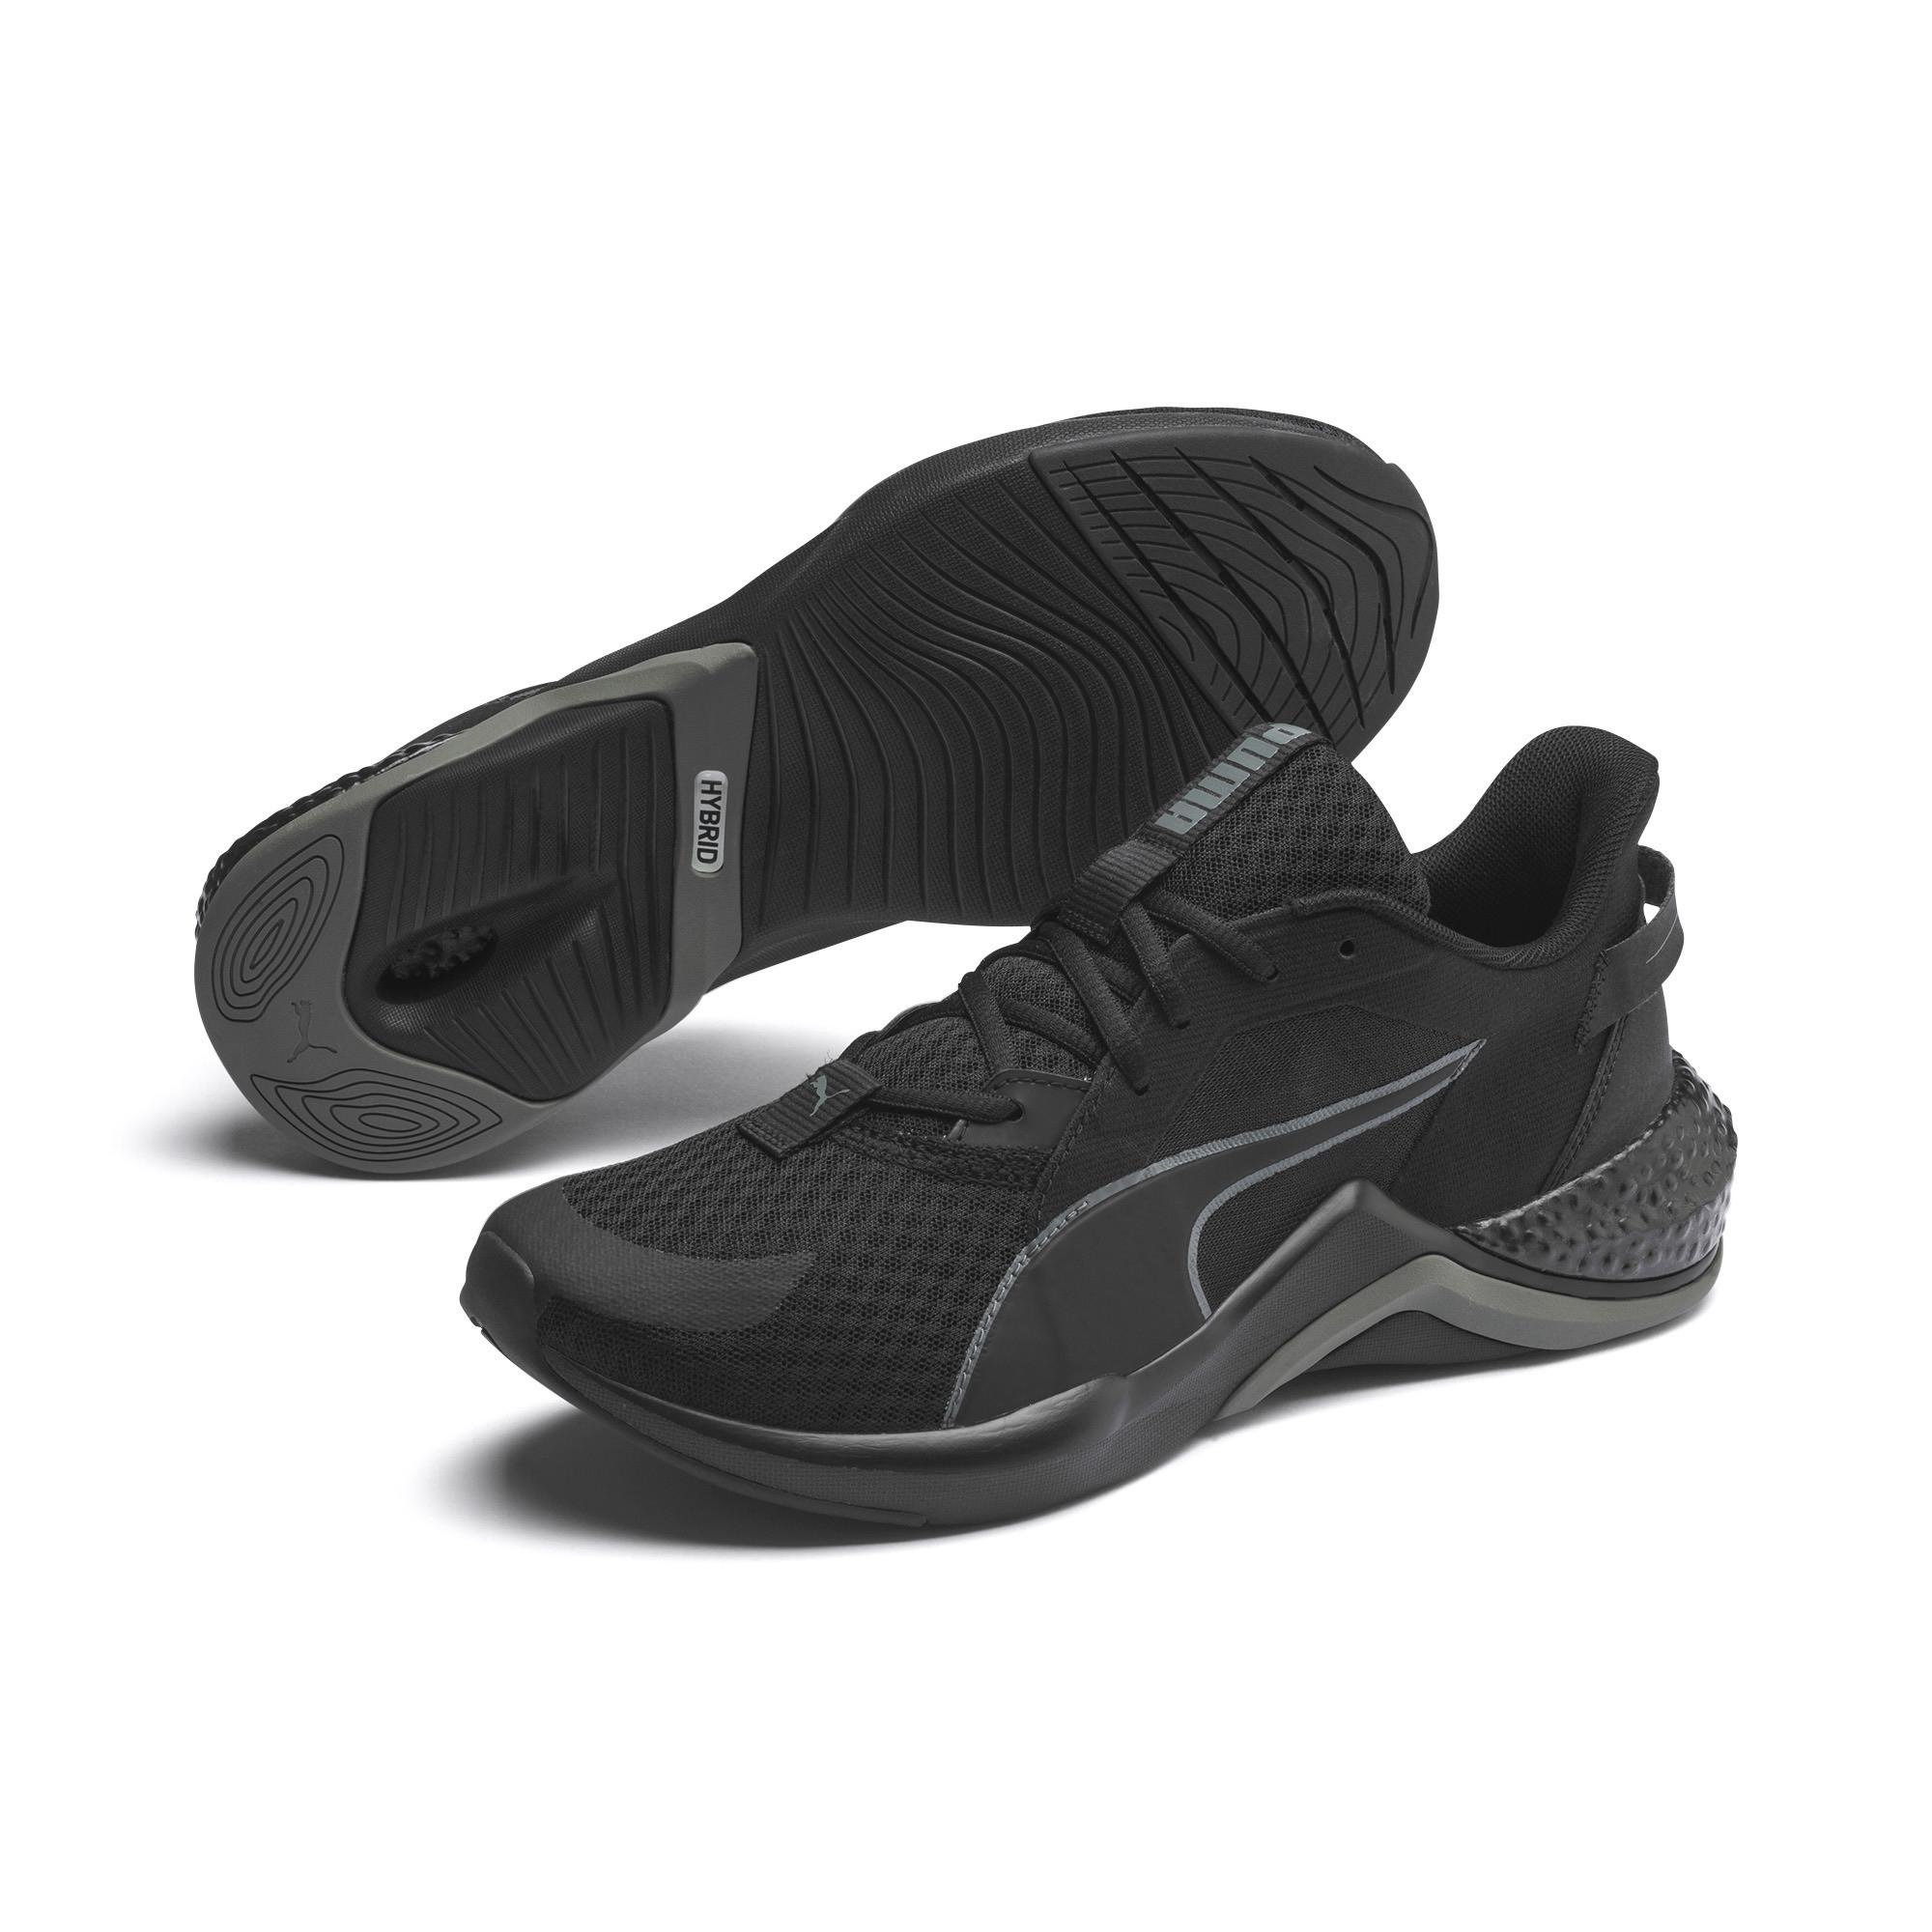 Puma Ozone Men's Sneaker